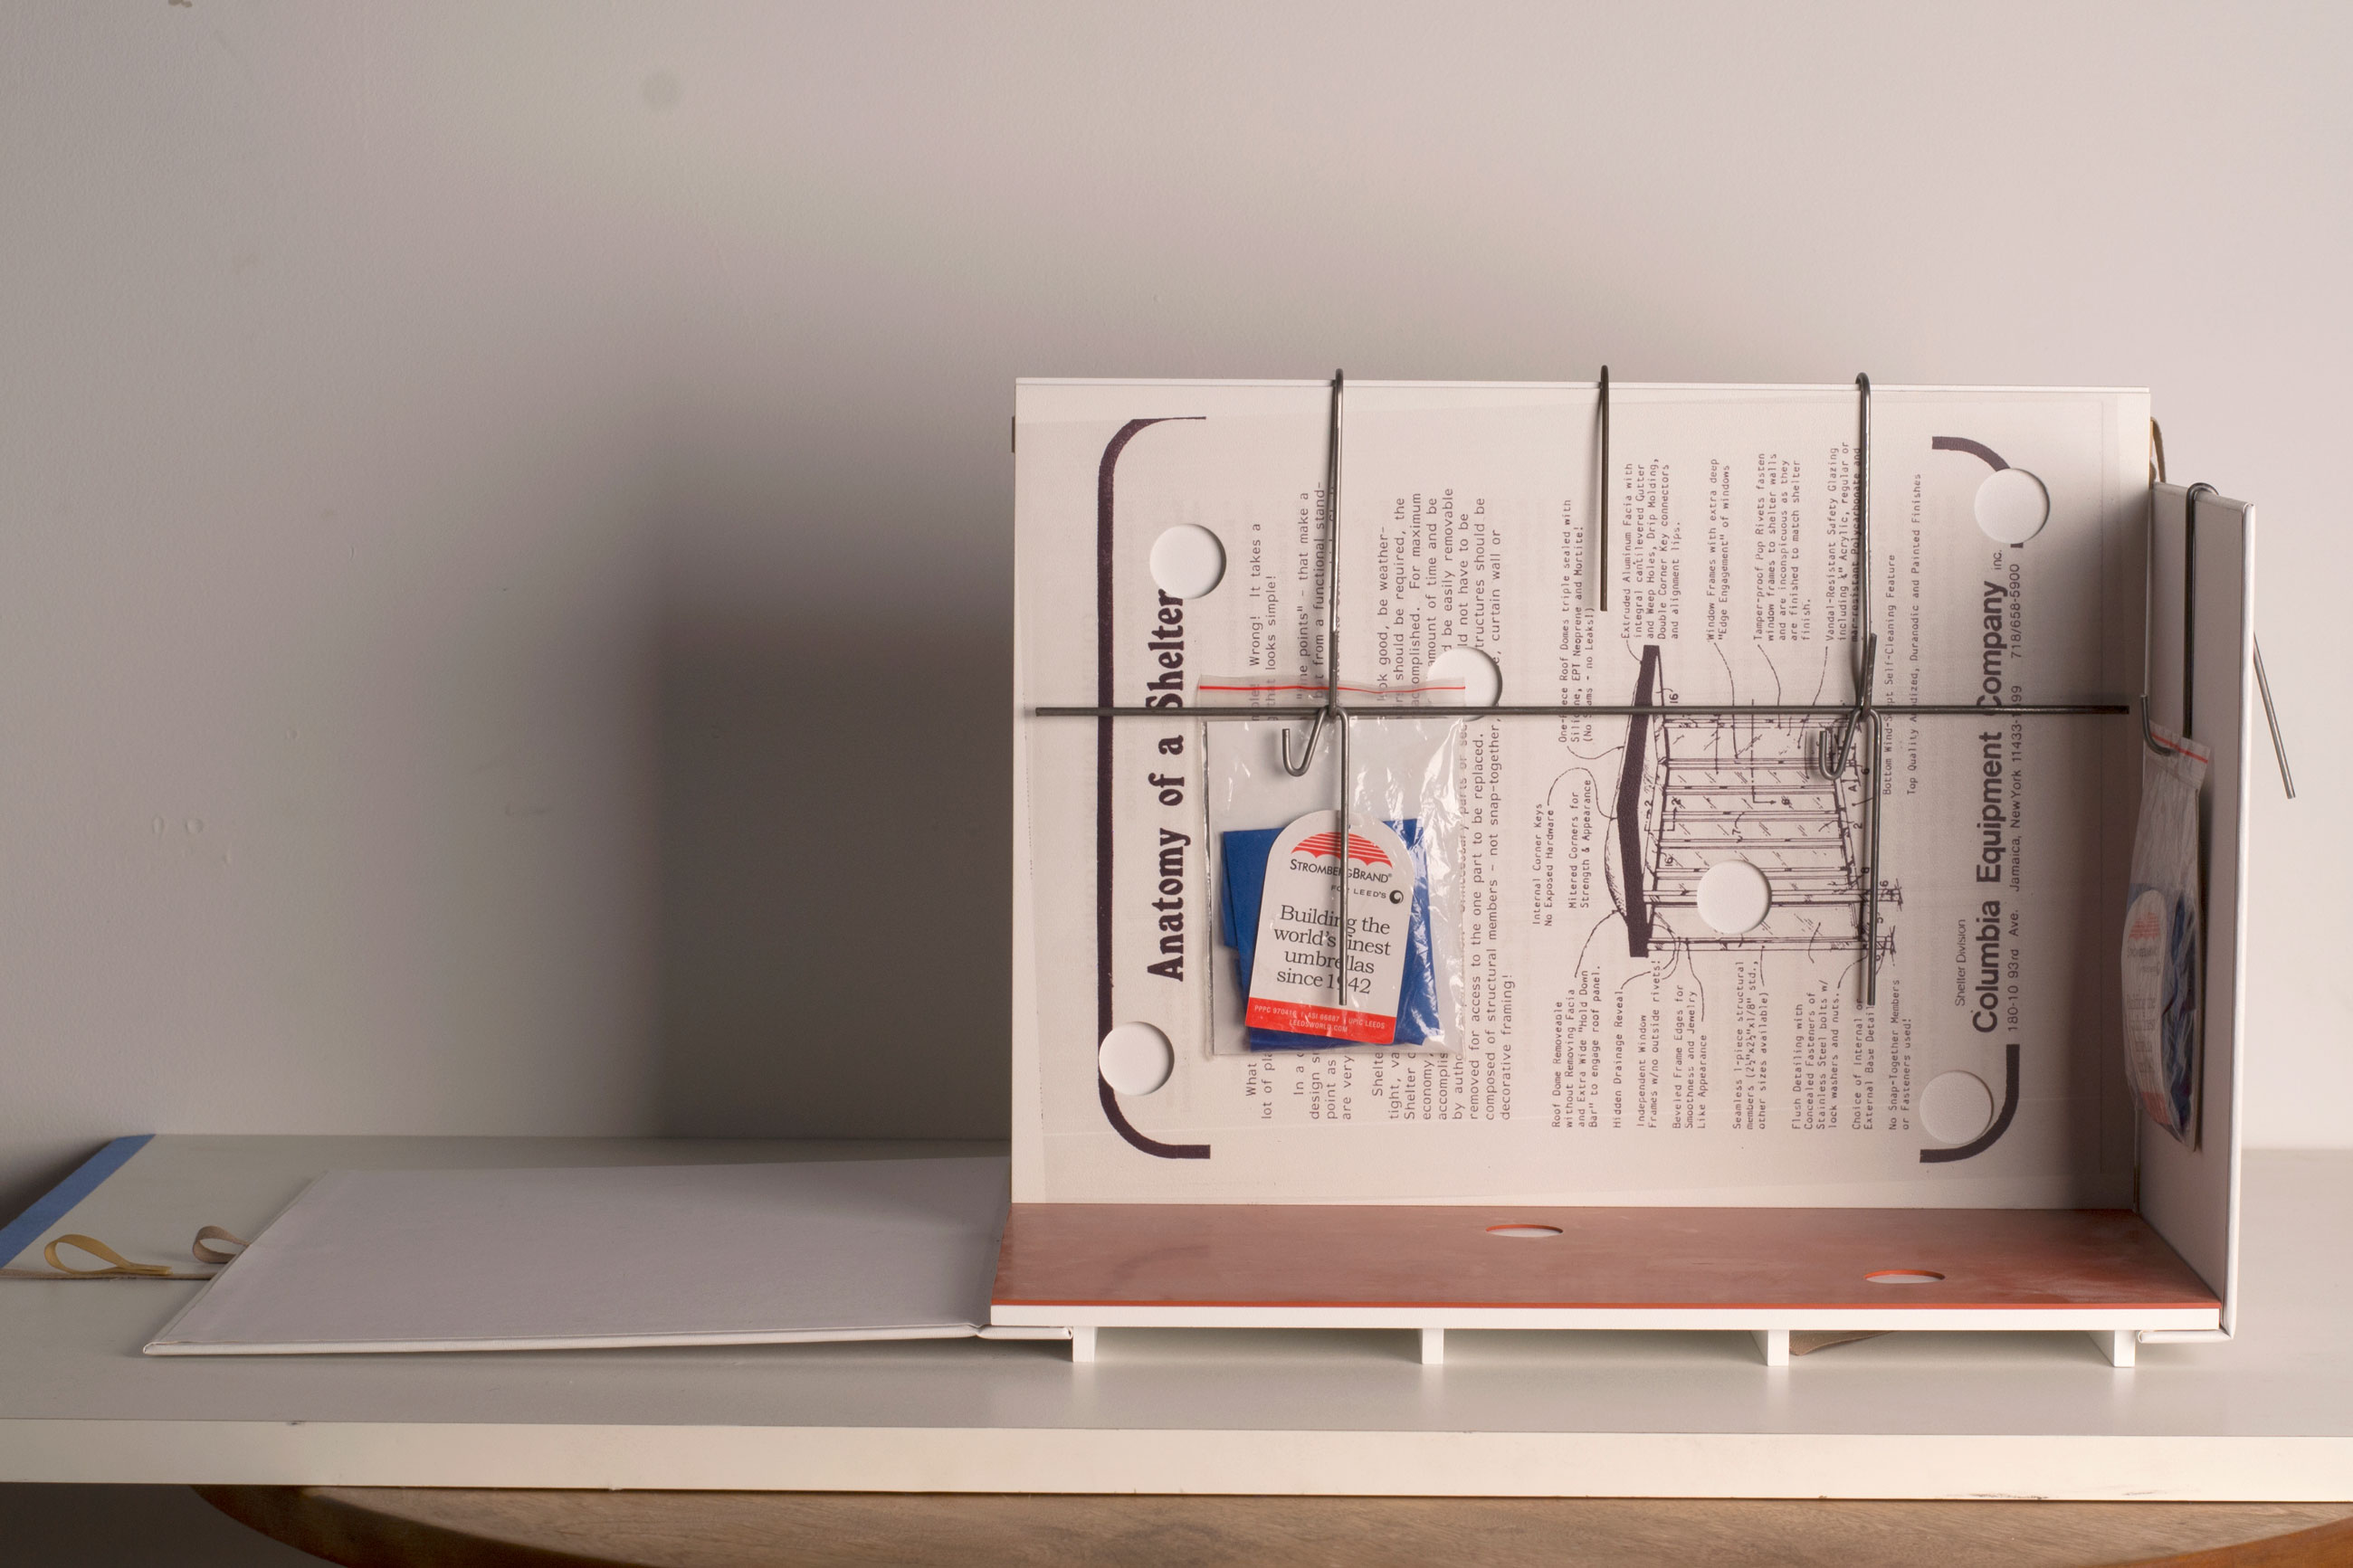 Box sets jesse stecklow silicone ribbon button wire powdercoated and printed steel screenprinted shoebox segments la bus tokens la metro library archivist business card colourmoves